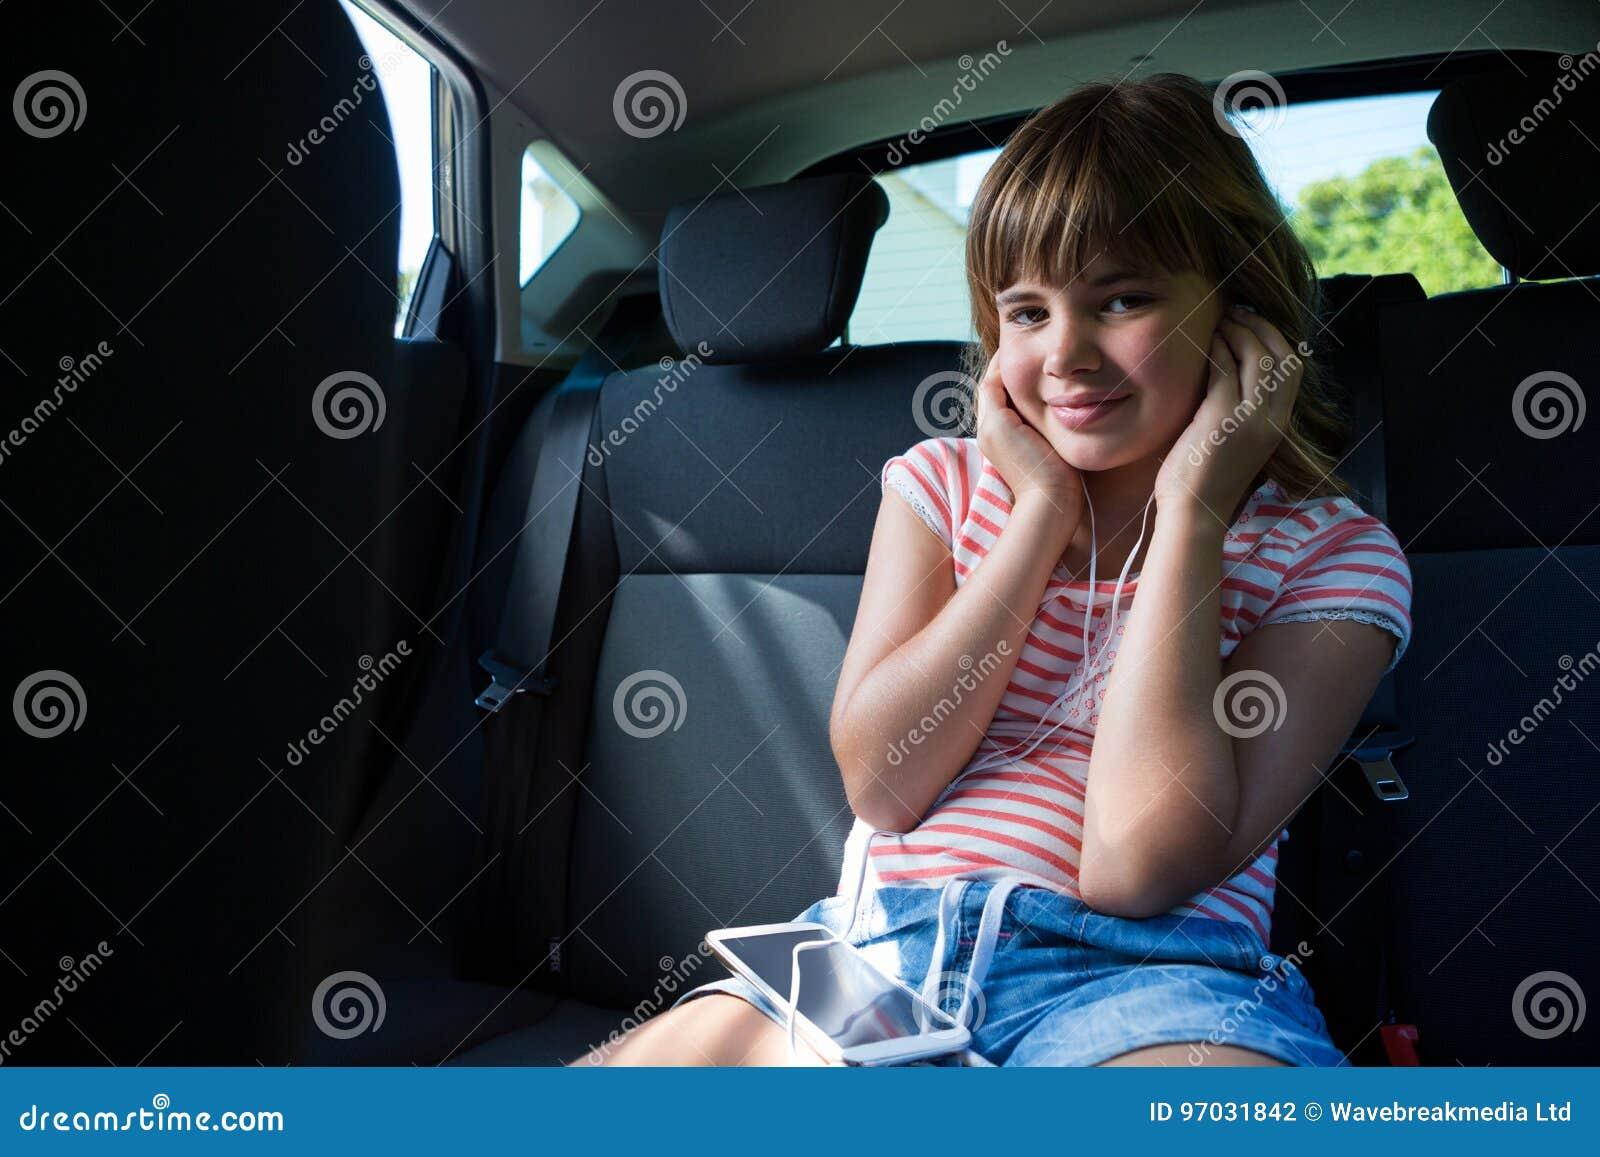 Фото девушки на заднем сидении авто